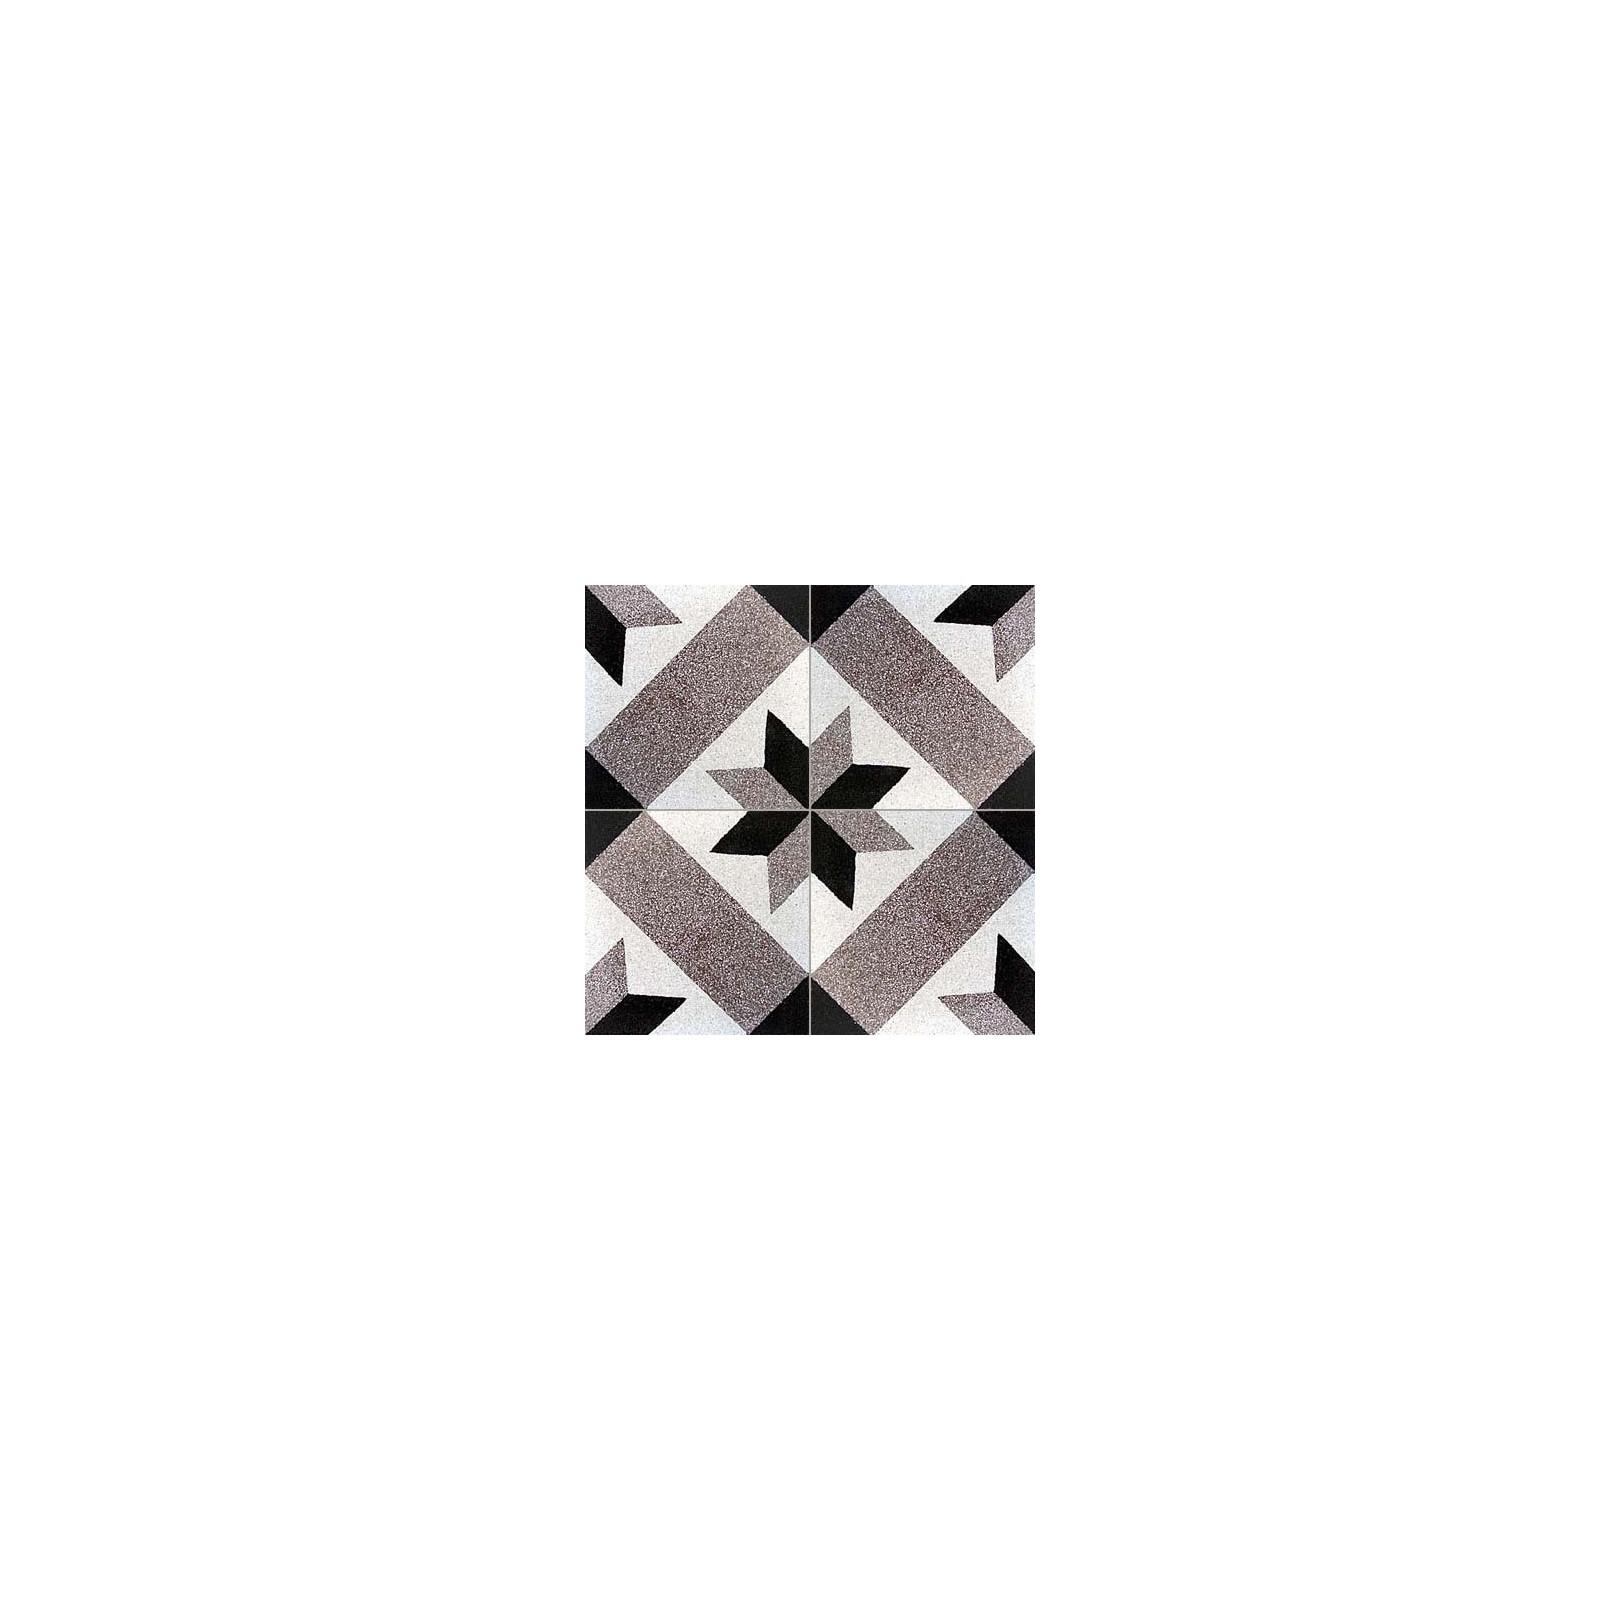 Carreau de terrazzo motif marron, noir et grige ETOILE 28.07.01